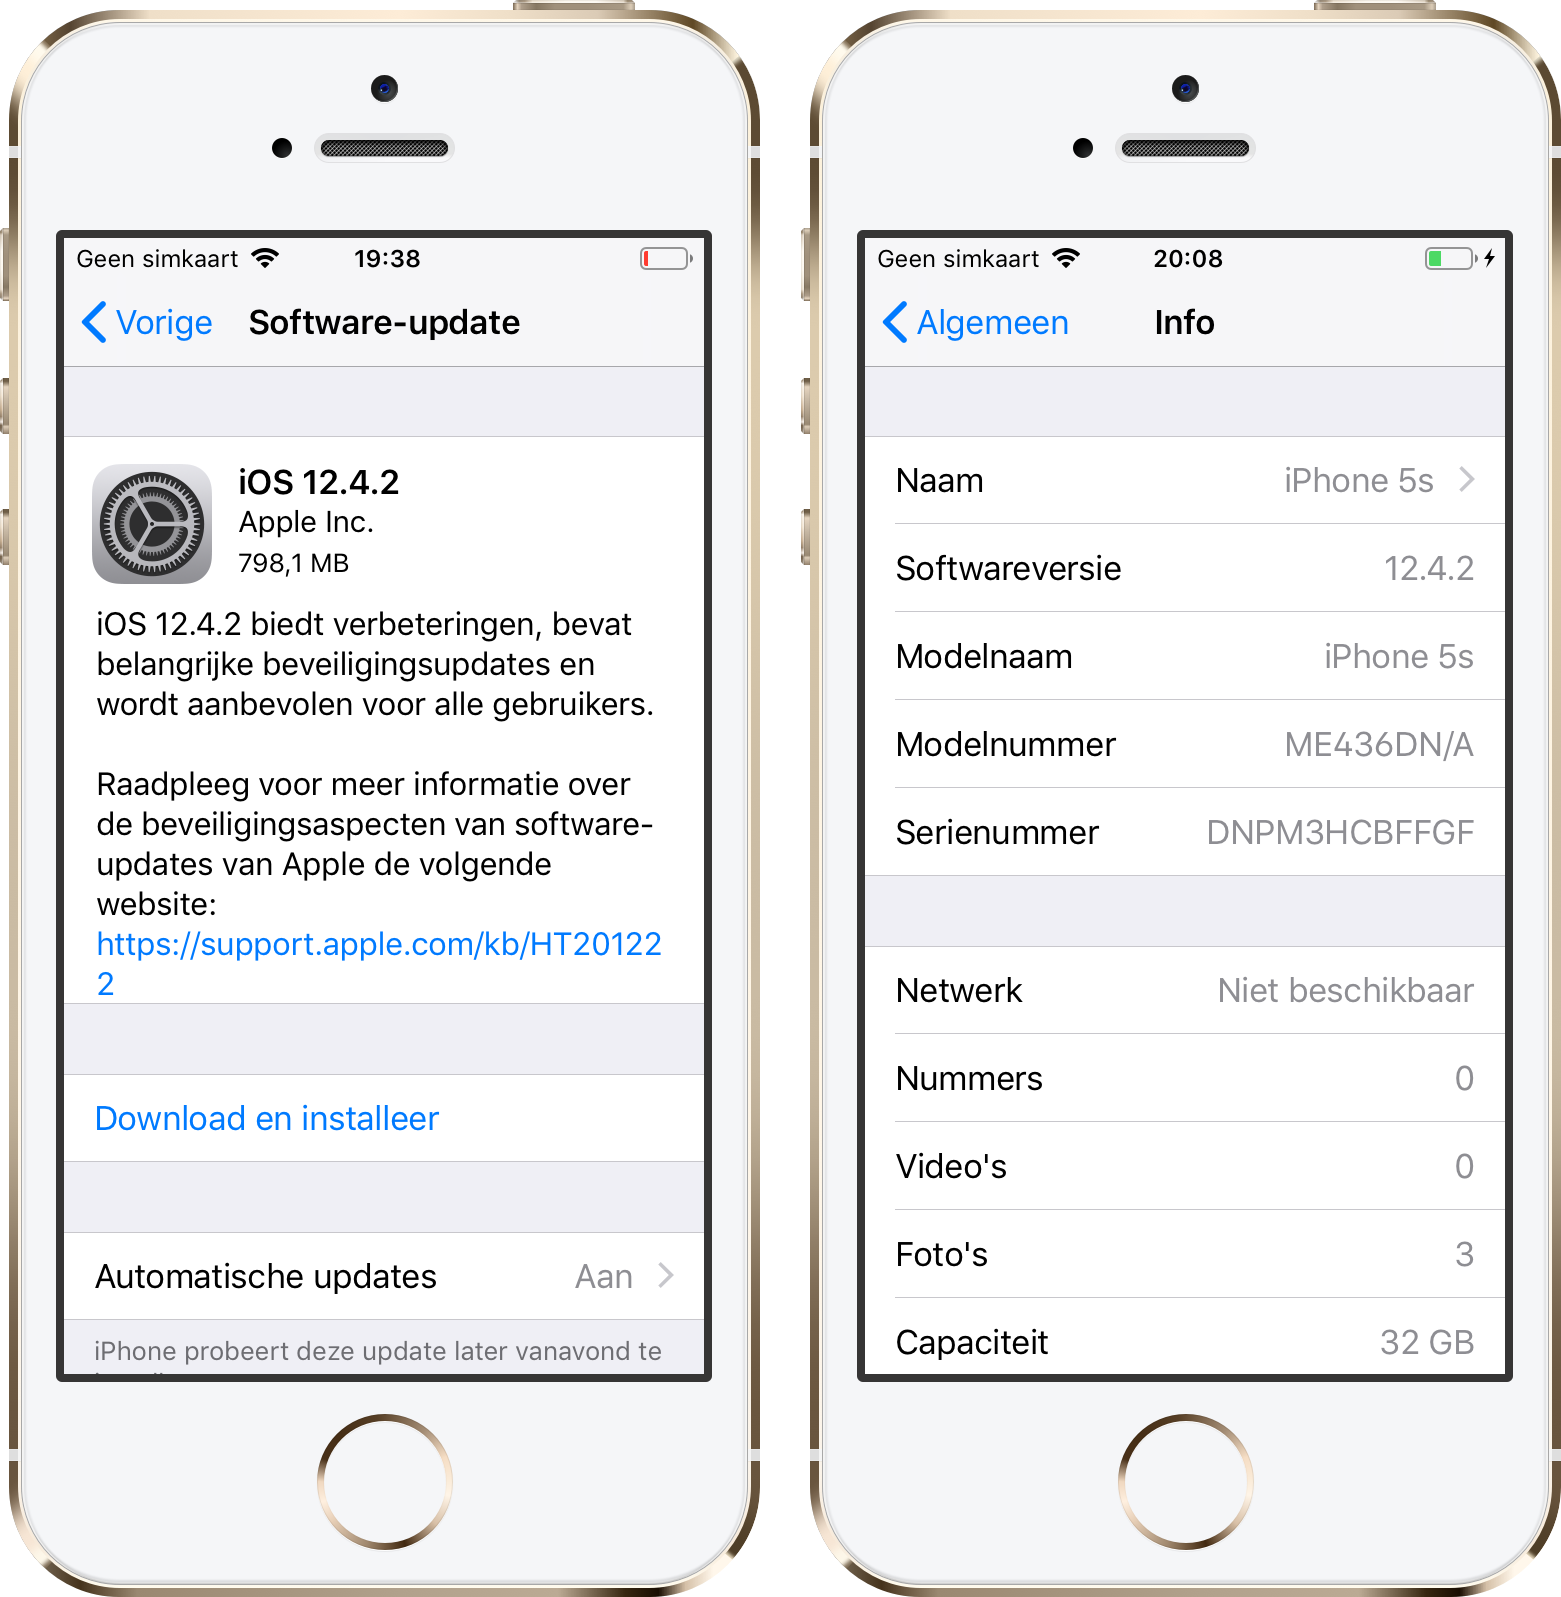 Iphone 6 software update